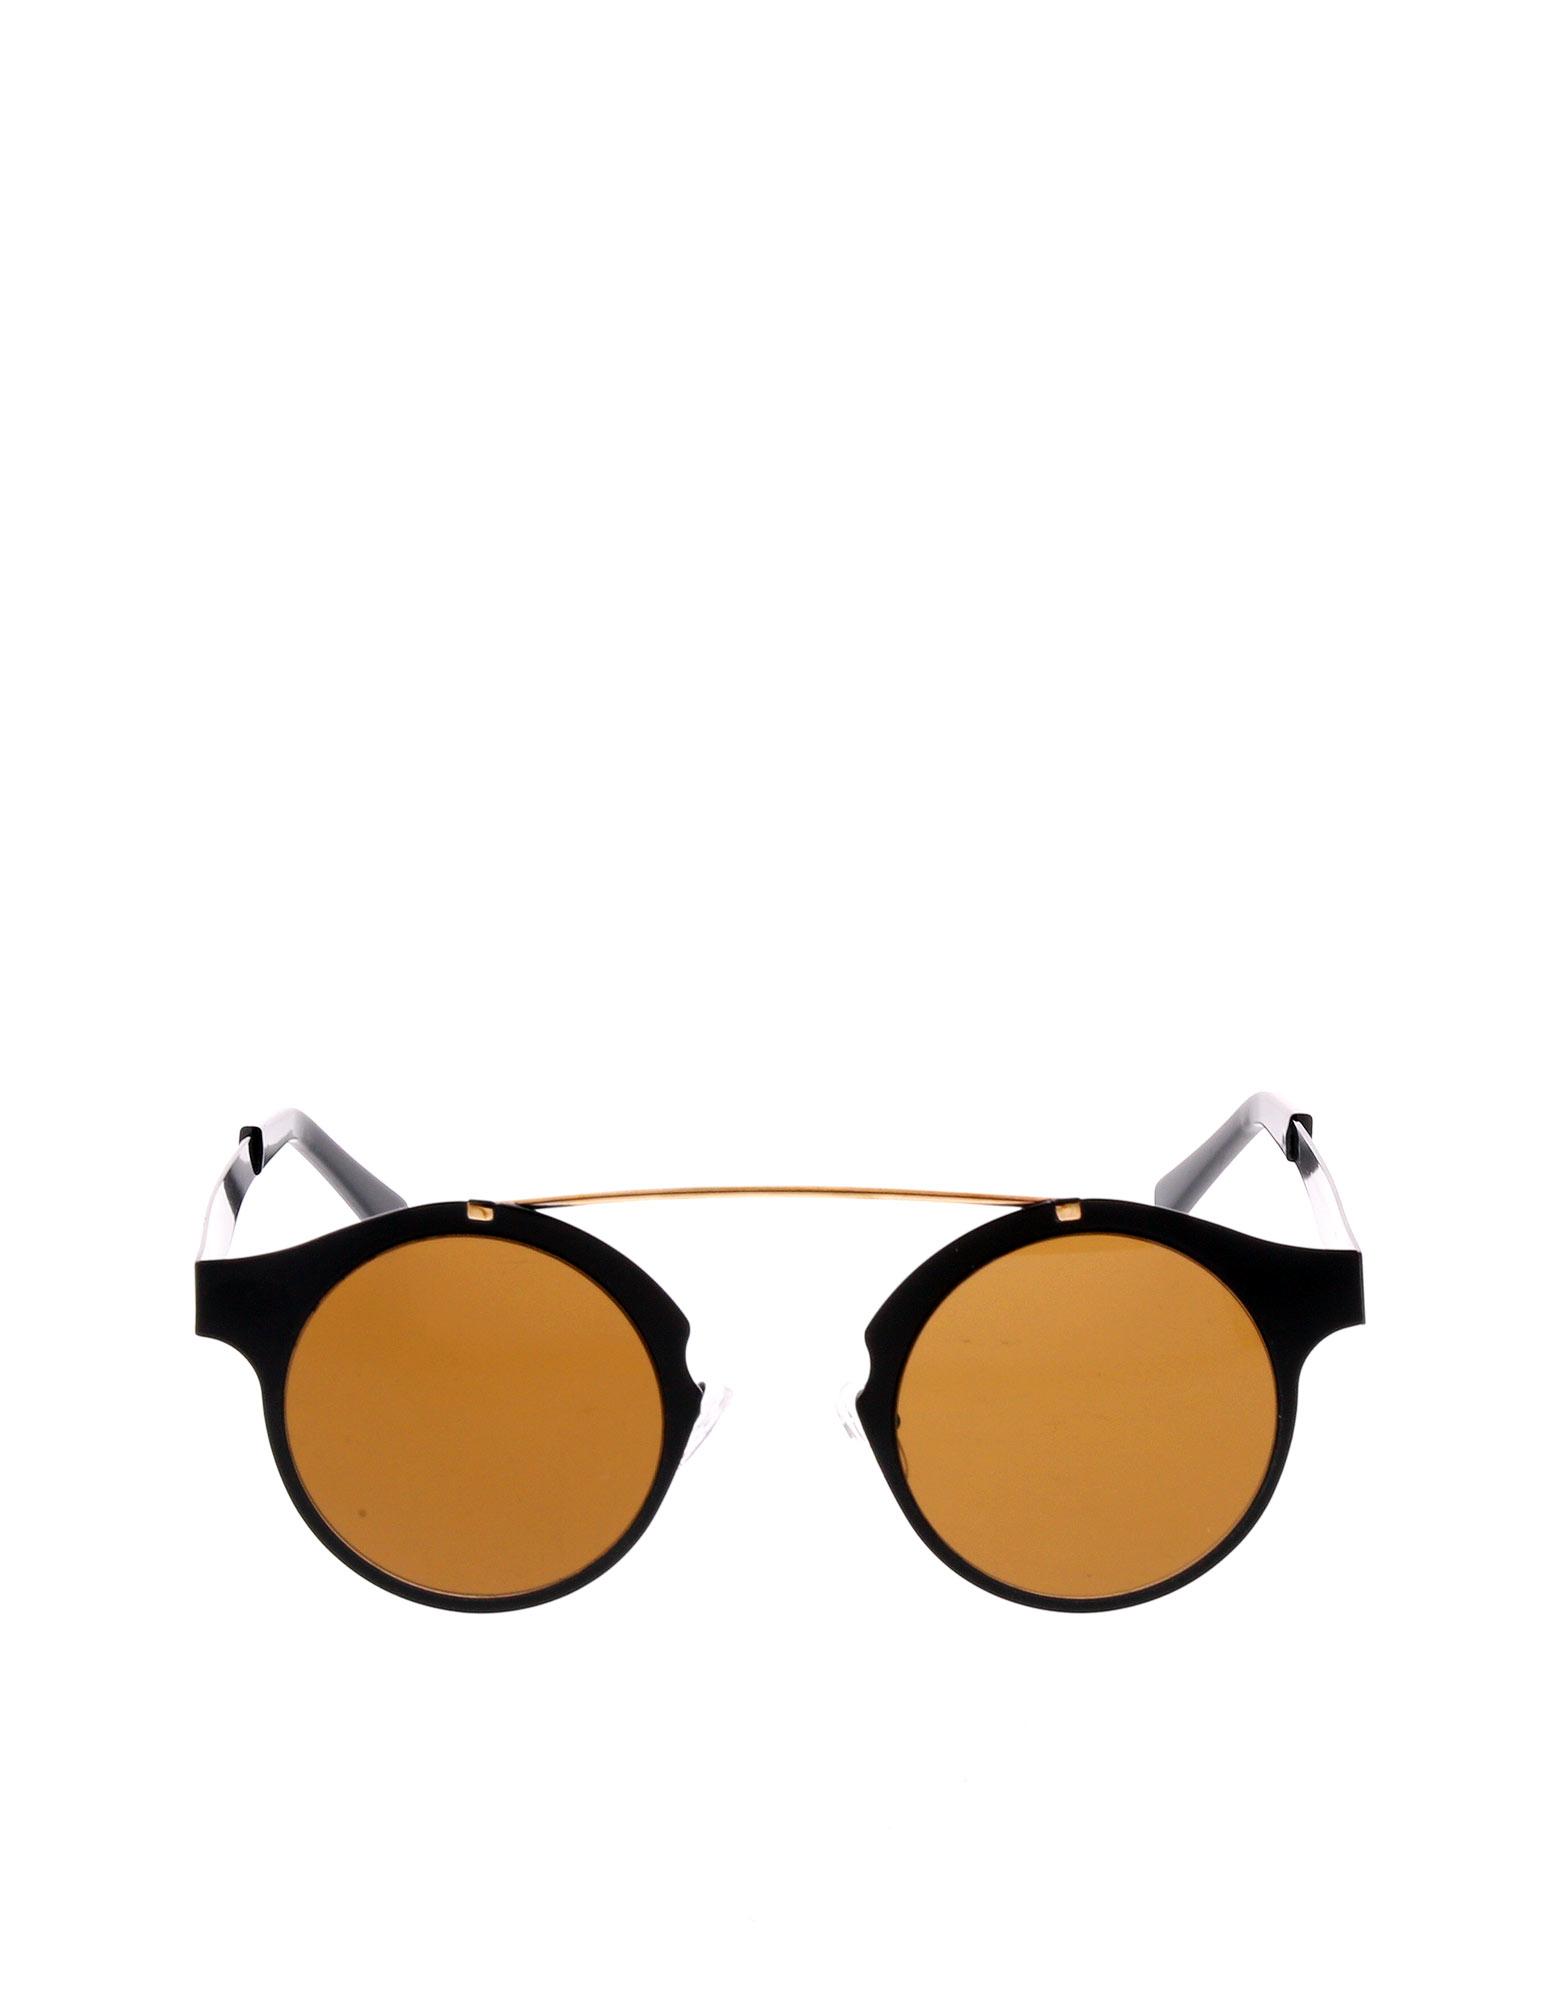 Spitfire Uk Intergalactic Black/Gold/Brown Sunglasses